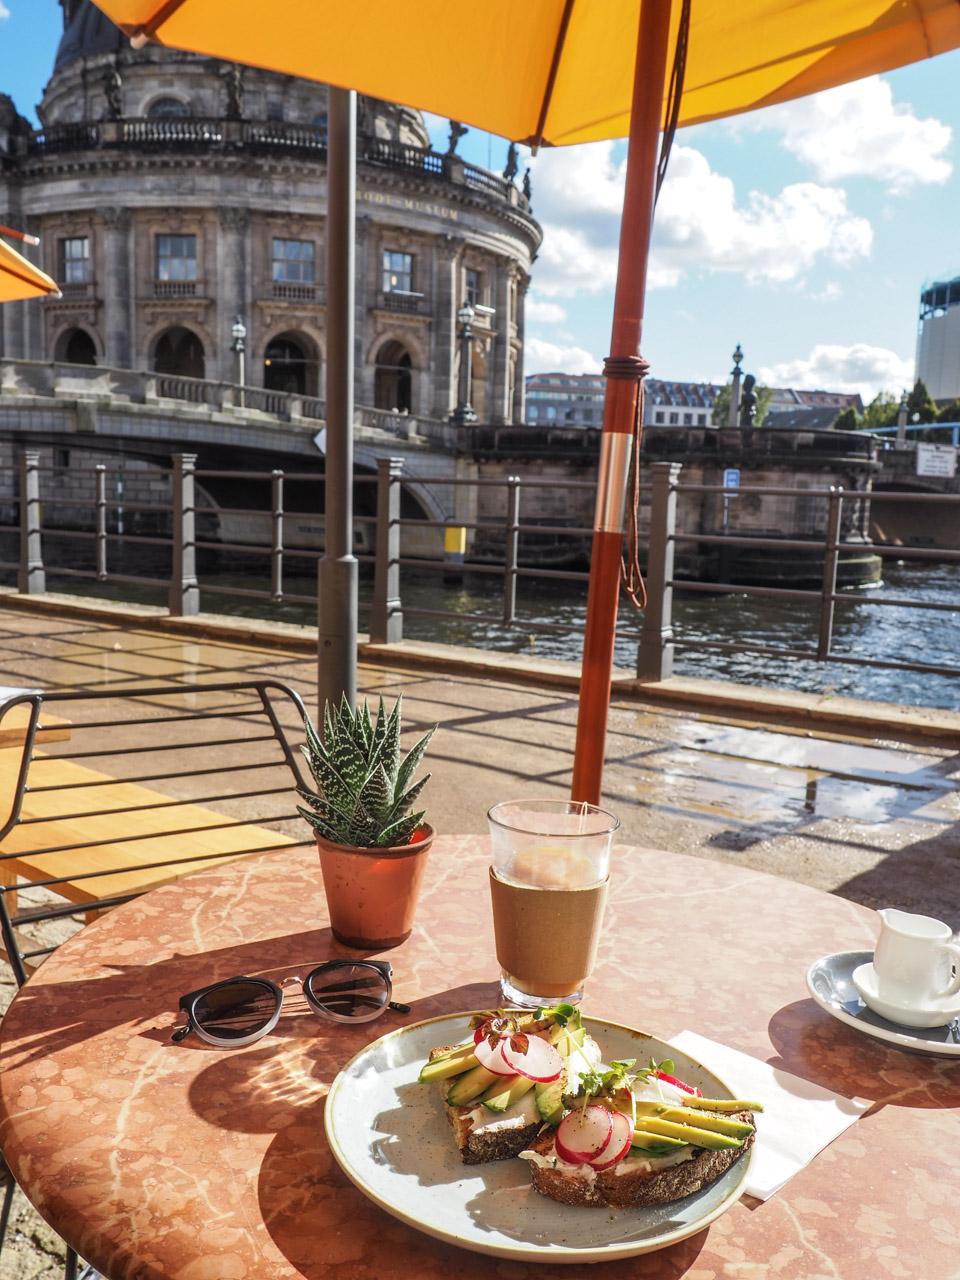 Avocado cafe Berlin